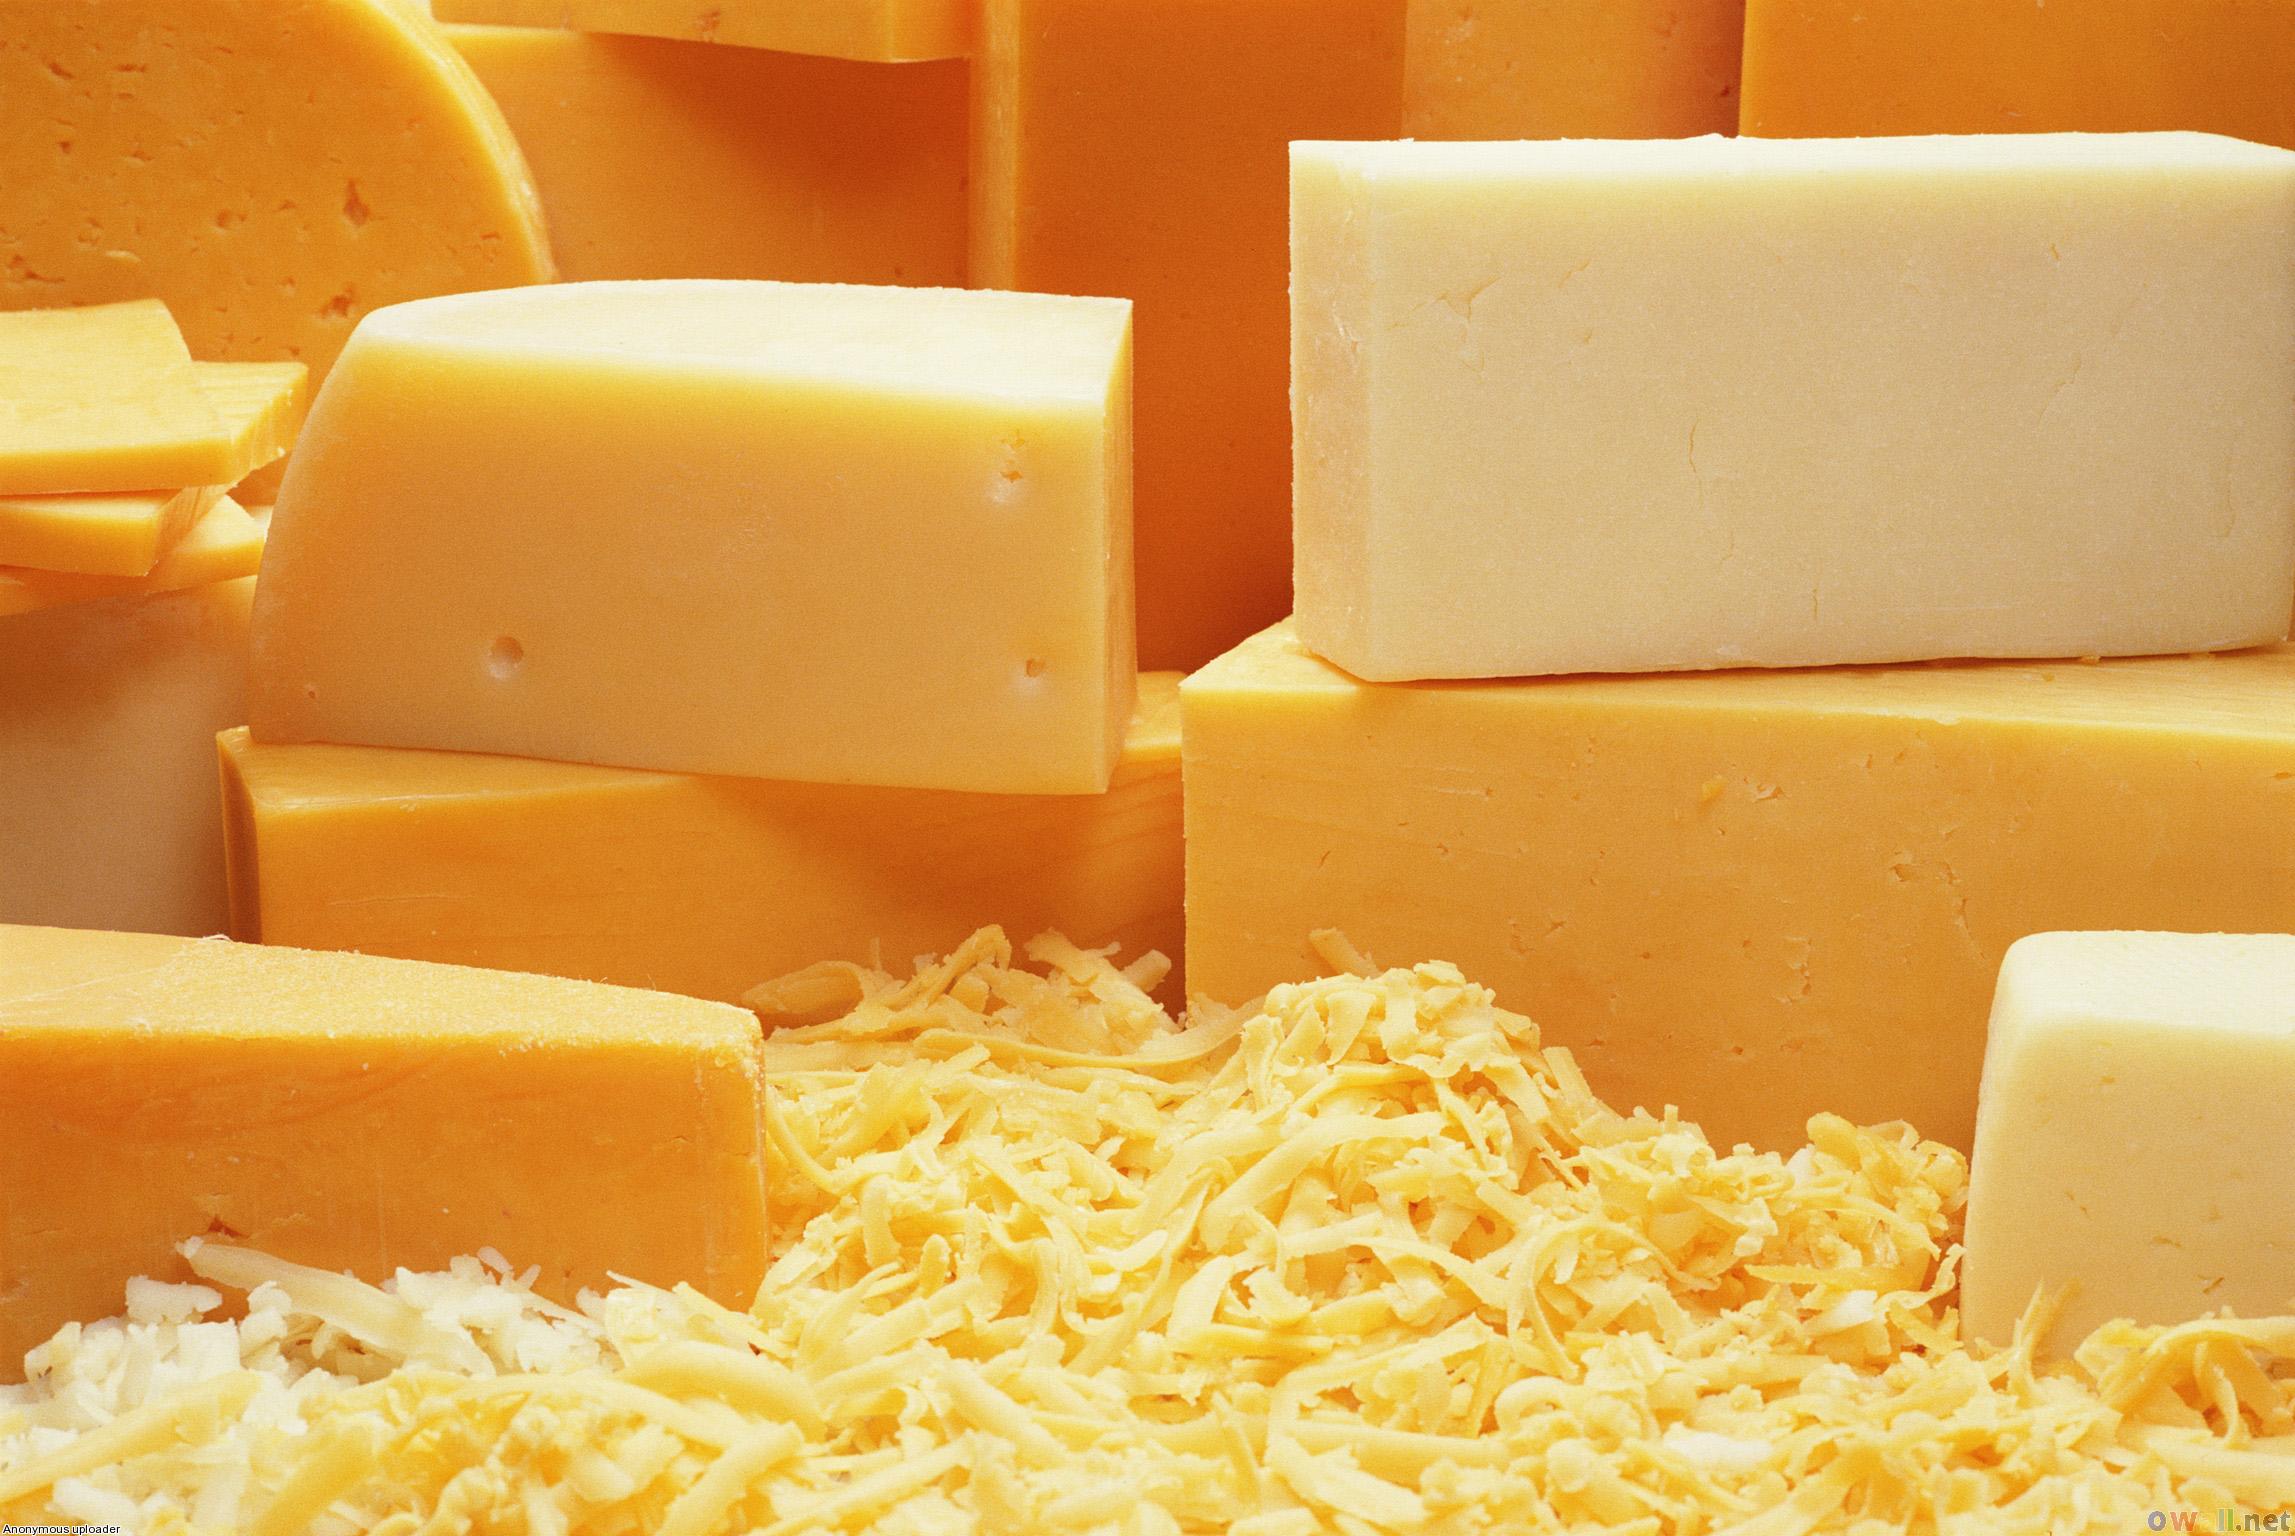 High Resolution Wallpaper | Cheese 2295x1536 px